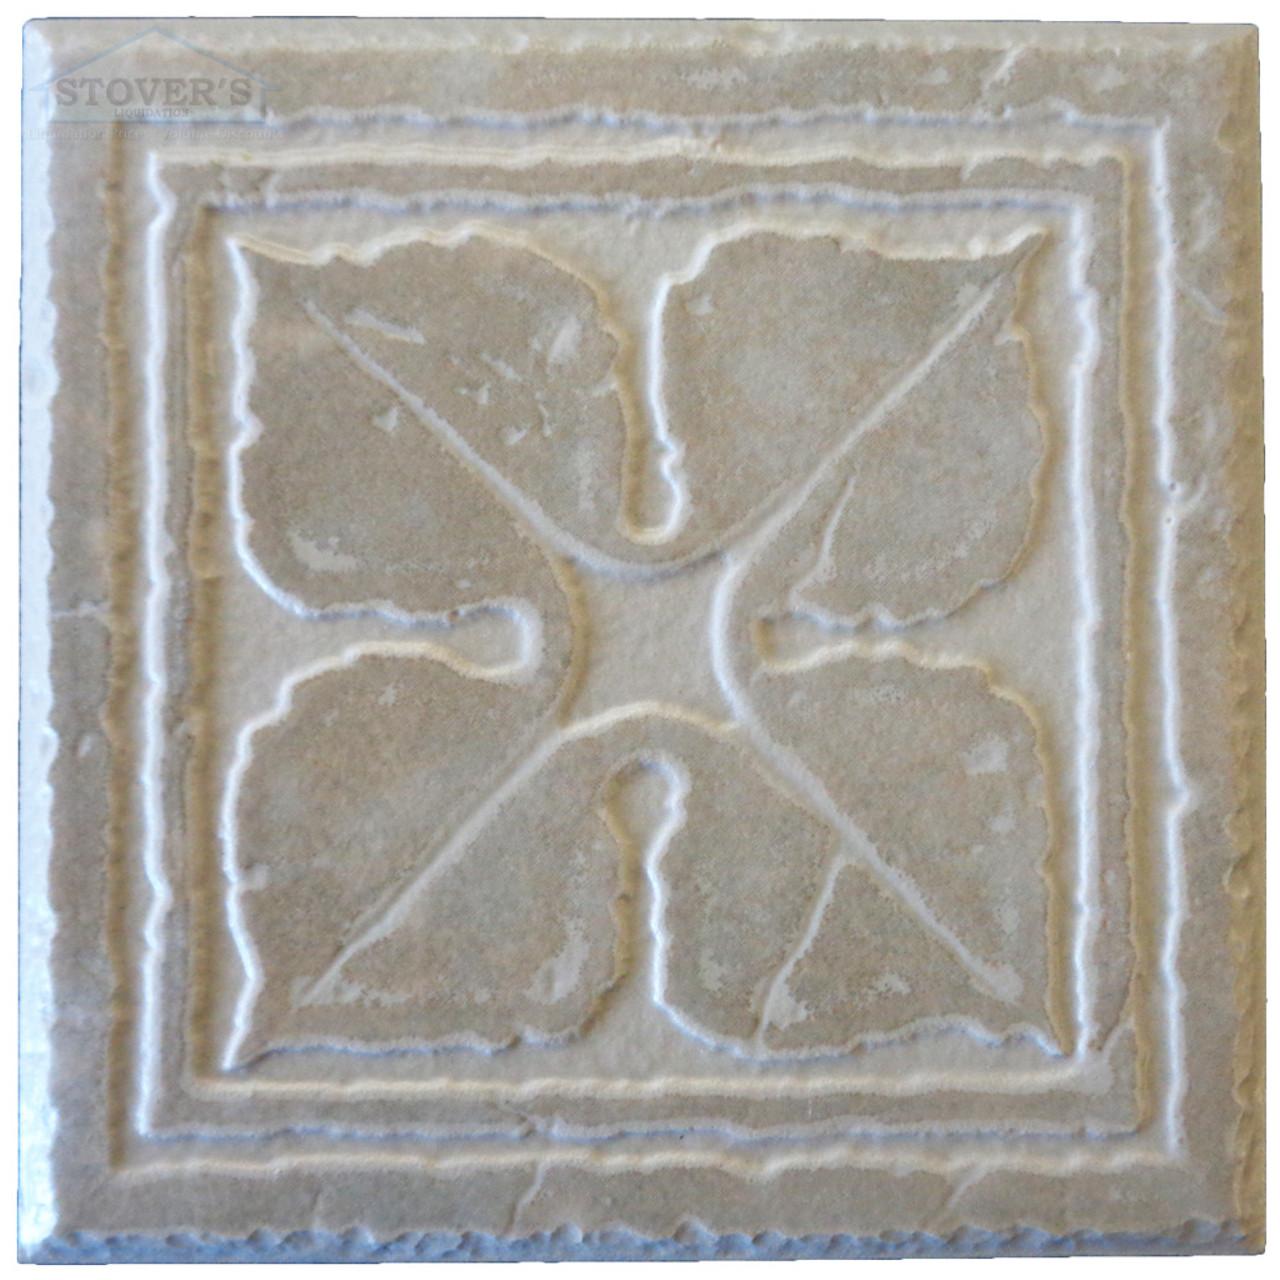 4x4 porcelain deco interceramic set of 4 cinder